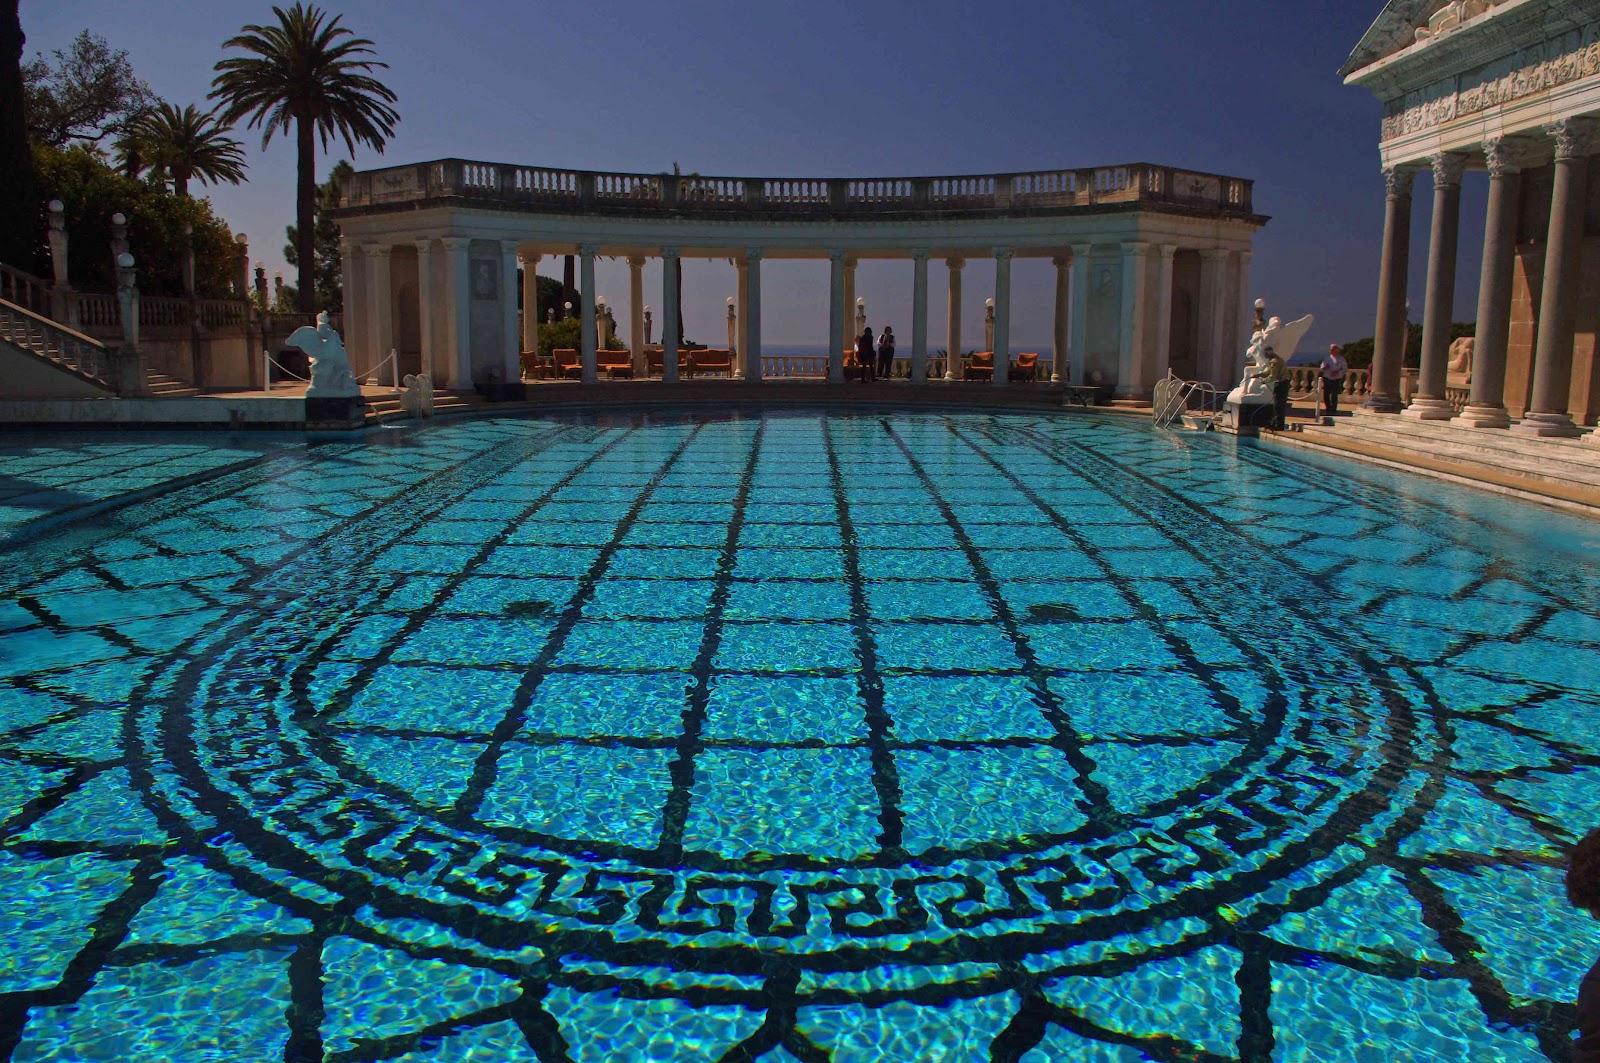 Usbackroads hearst castle san simeon california - Hearst castle neptune pool swim auction ...